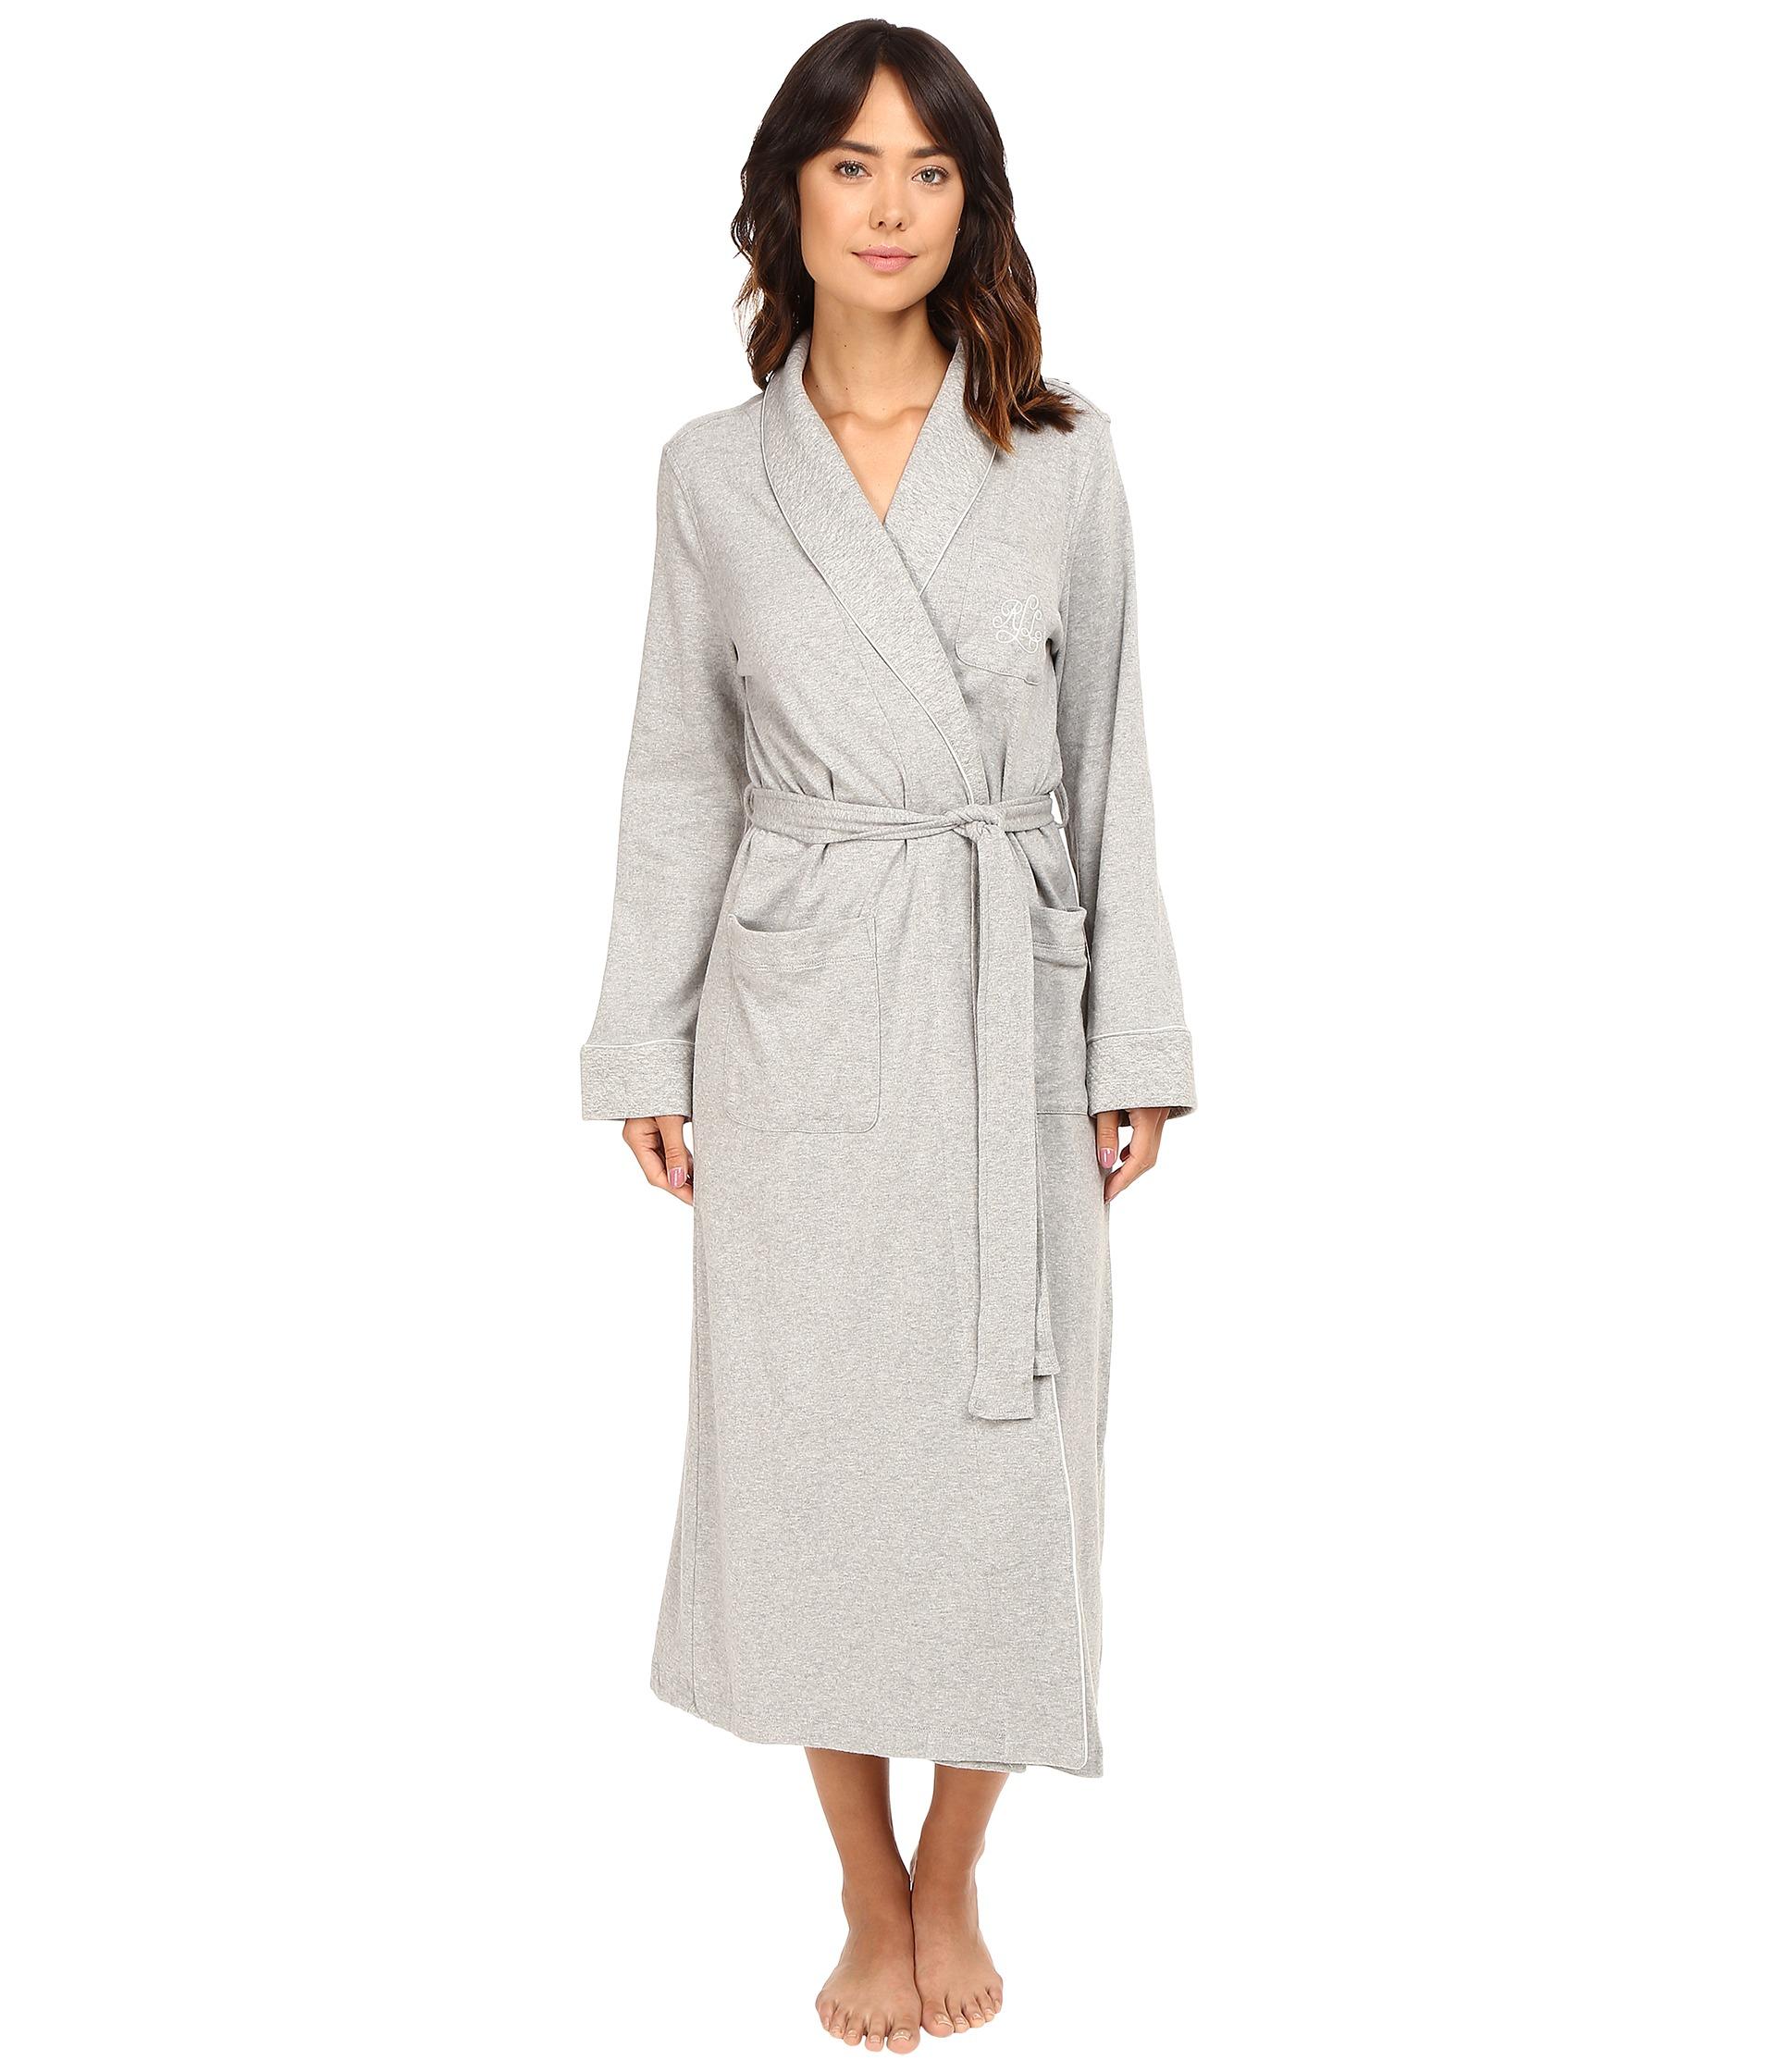 lauren ralph lauren quilted collar long robe heather grey free shipping both ways. Black Bedroom Furniture Sets. Home Design Ideas